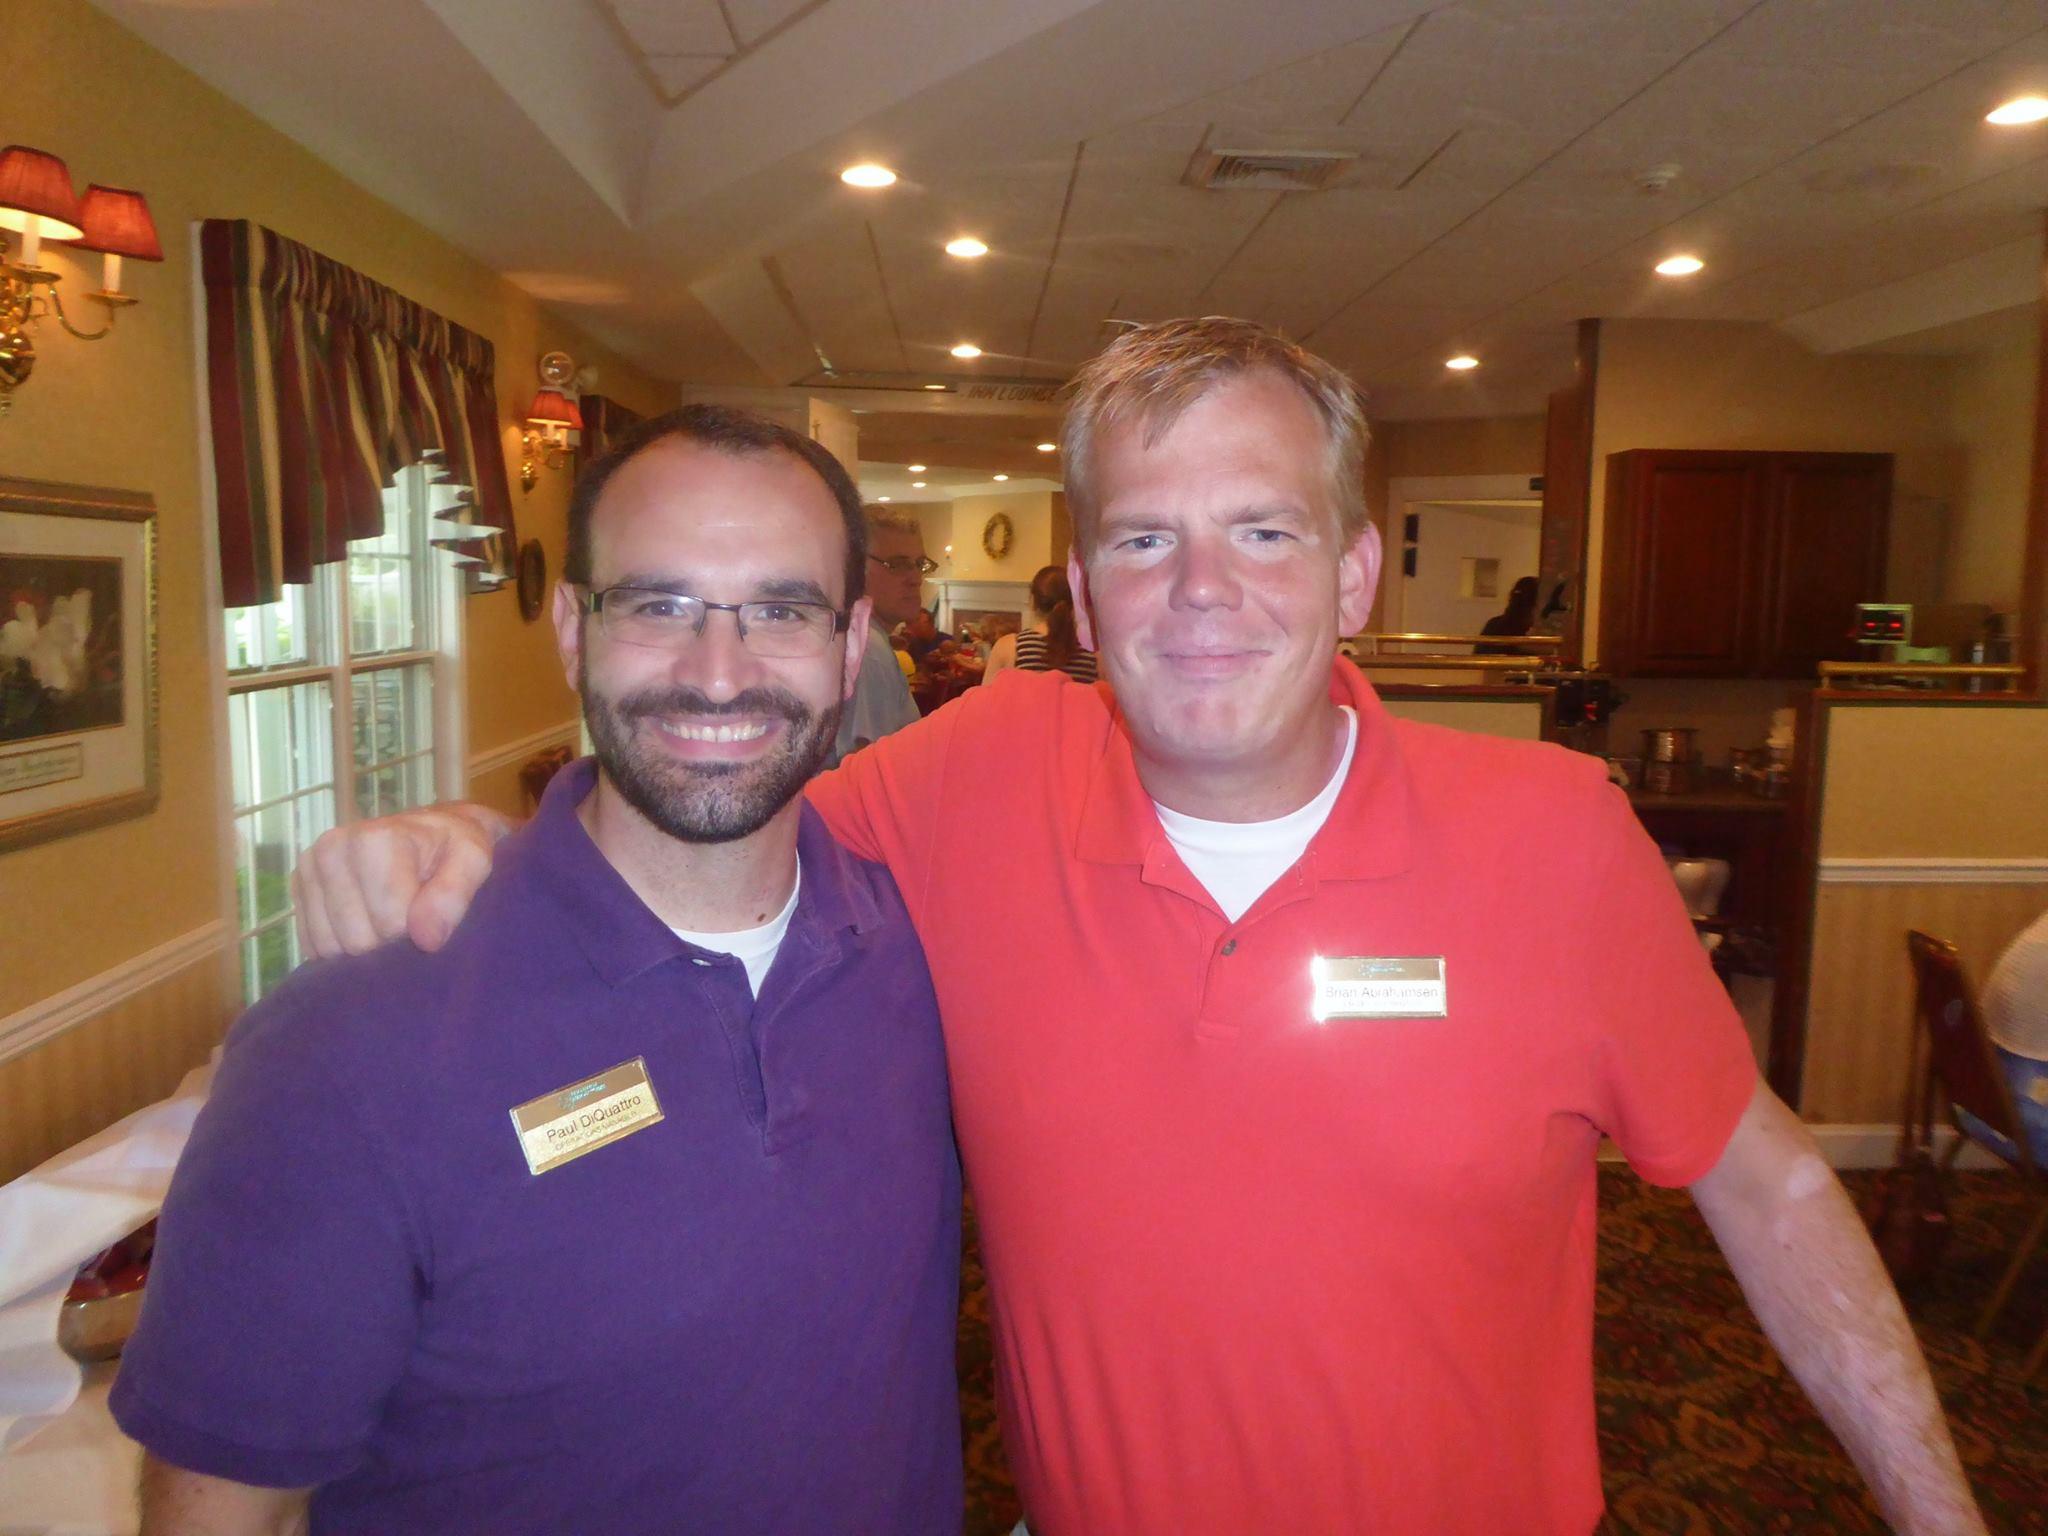 Paul DiQuattro and Brian Abrahamsen